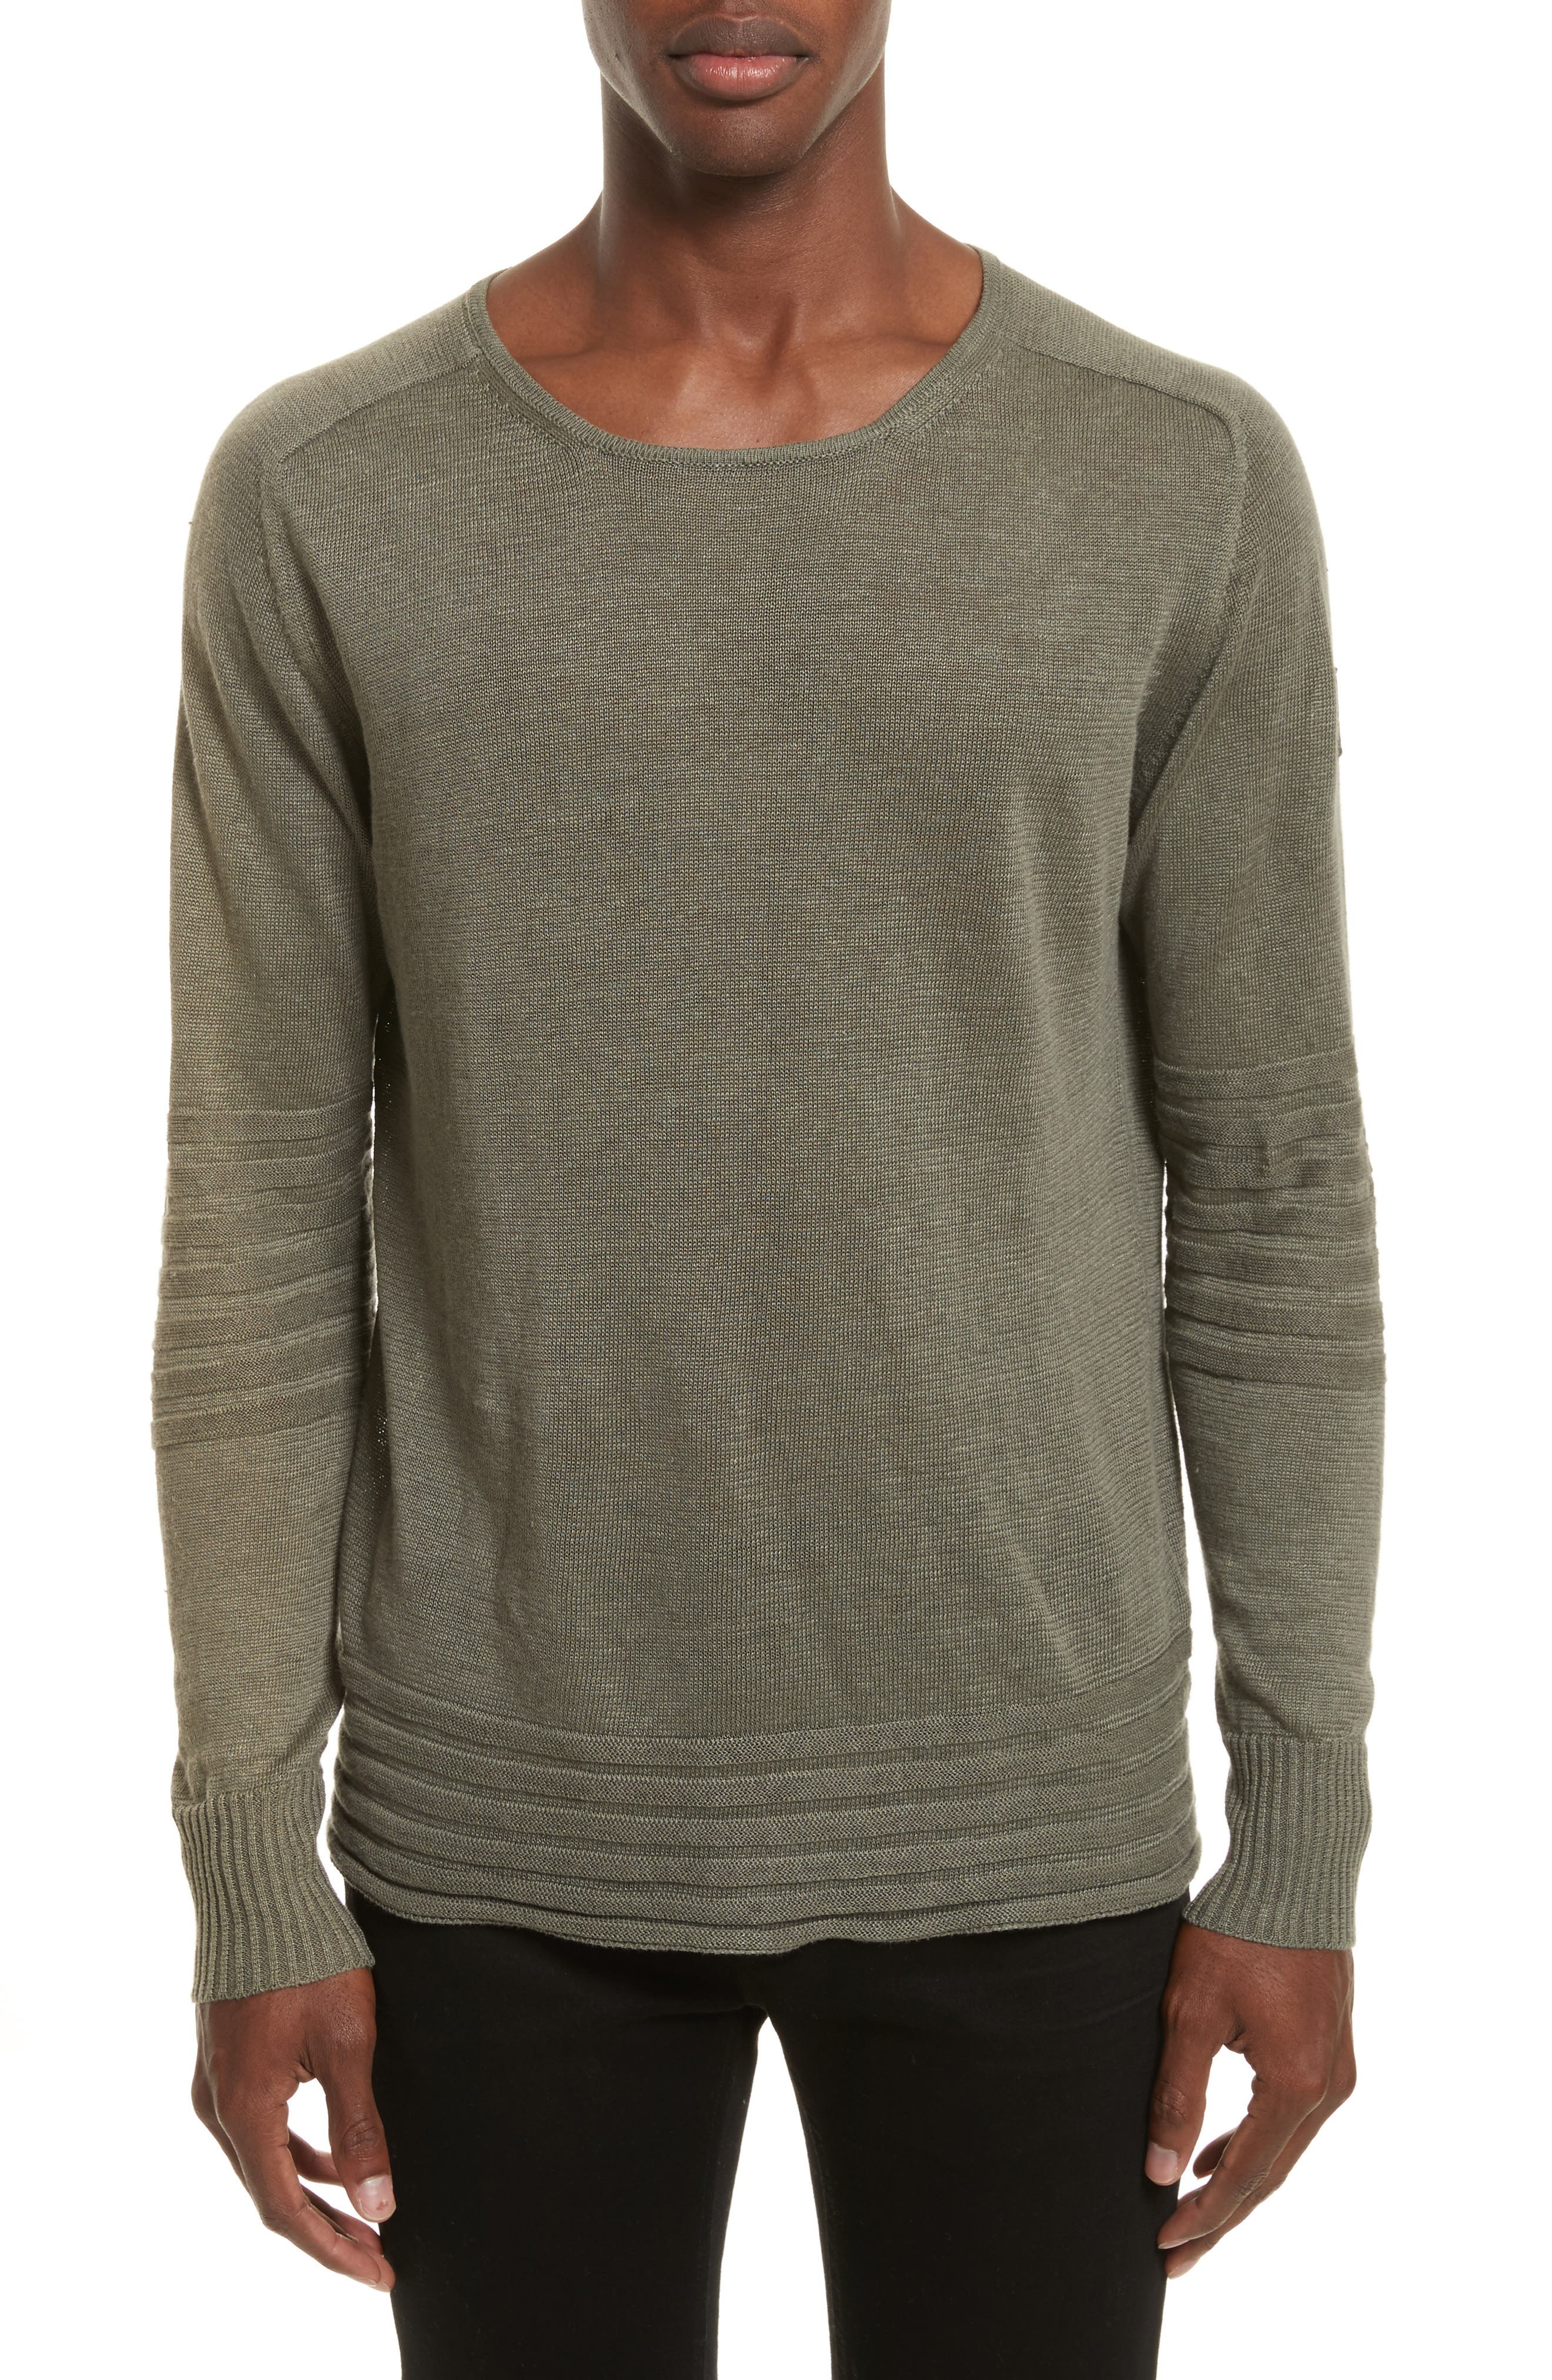 Main Image - Belstaff Exford Linen Crewneck Sweater